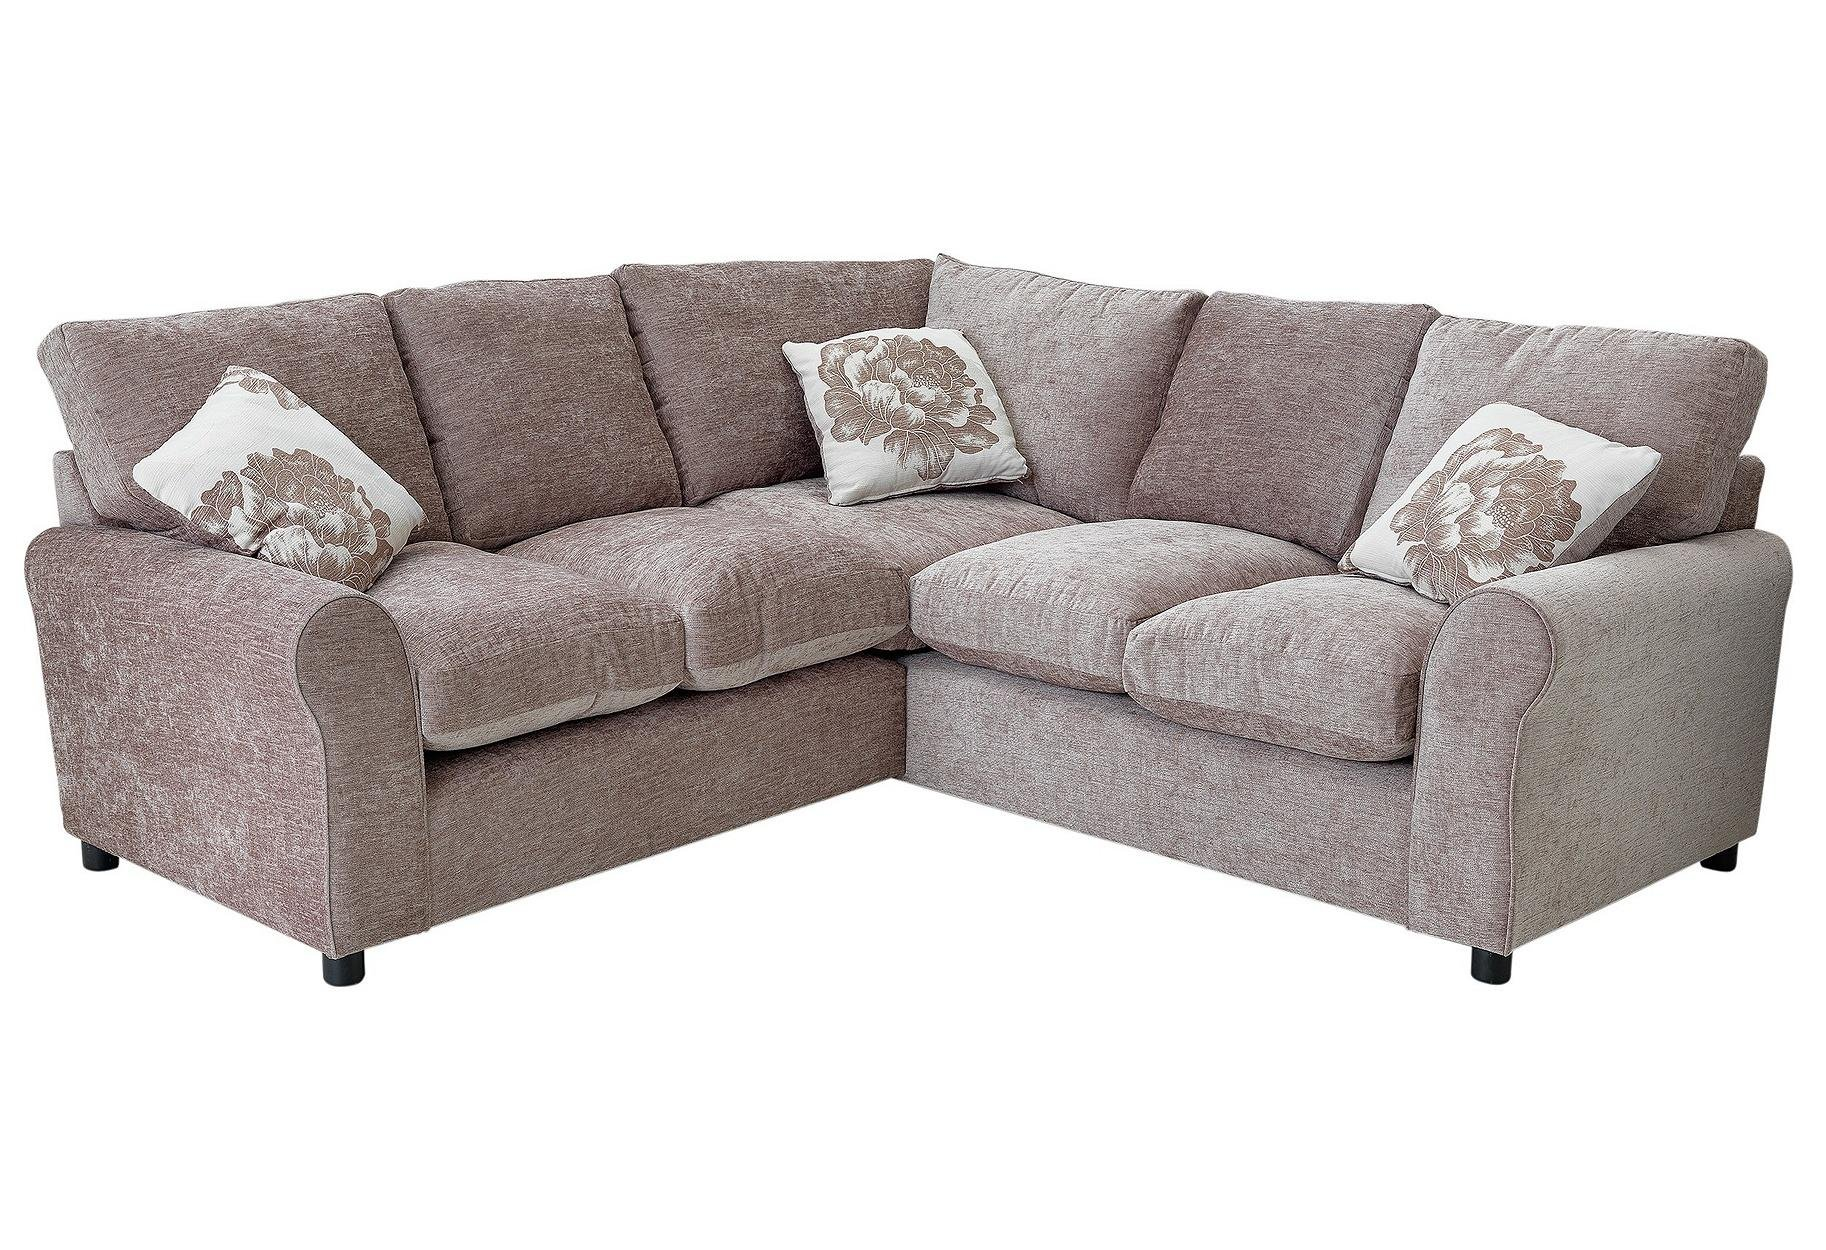 argos small sofa memsahebnet : 4997841RZ002AWebampDefaultPDP570 from memsaheb.net size 570 x 513 jpeg 30kB